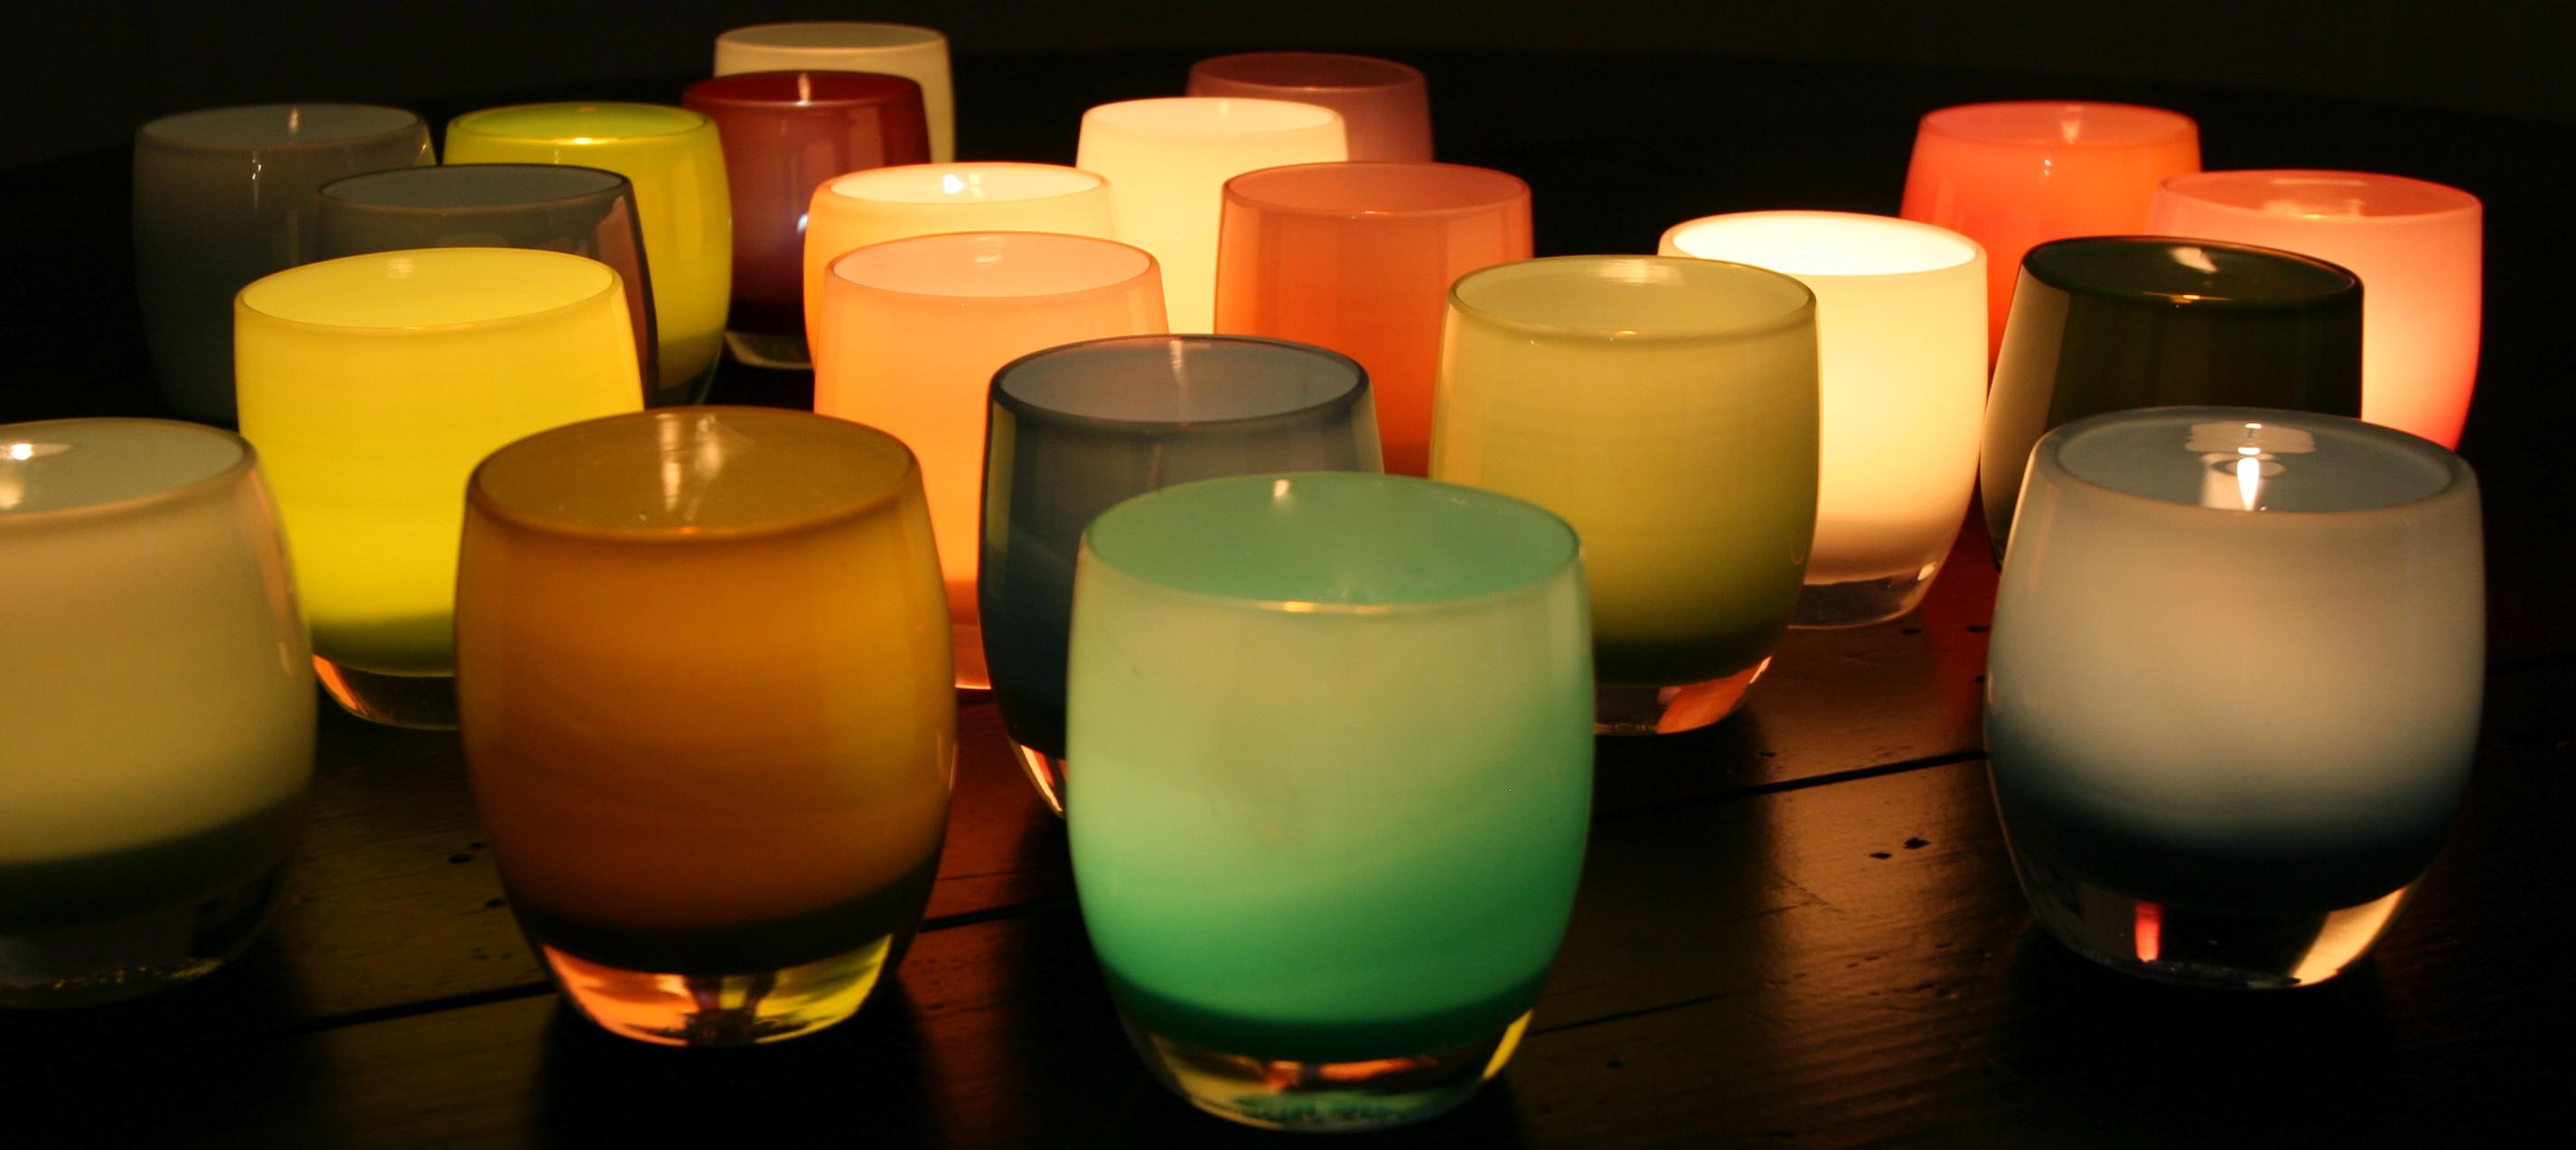 glassybaby, a symbol of hope & light